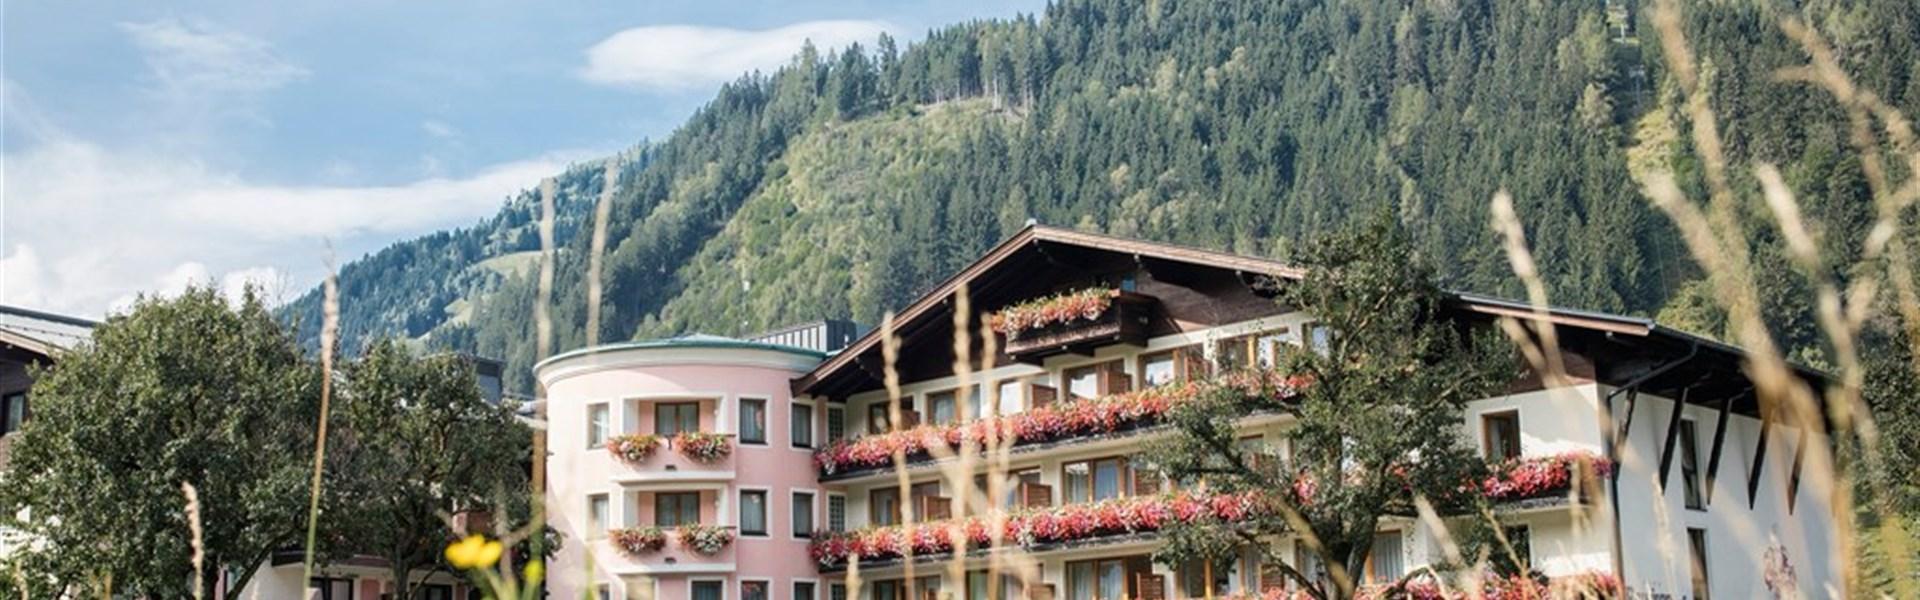 Hotel Rauriserhof -